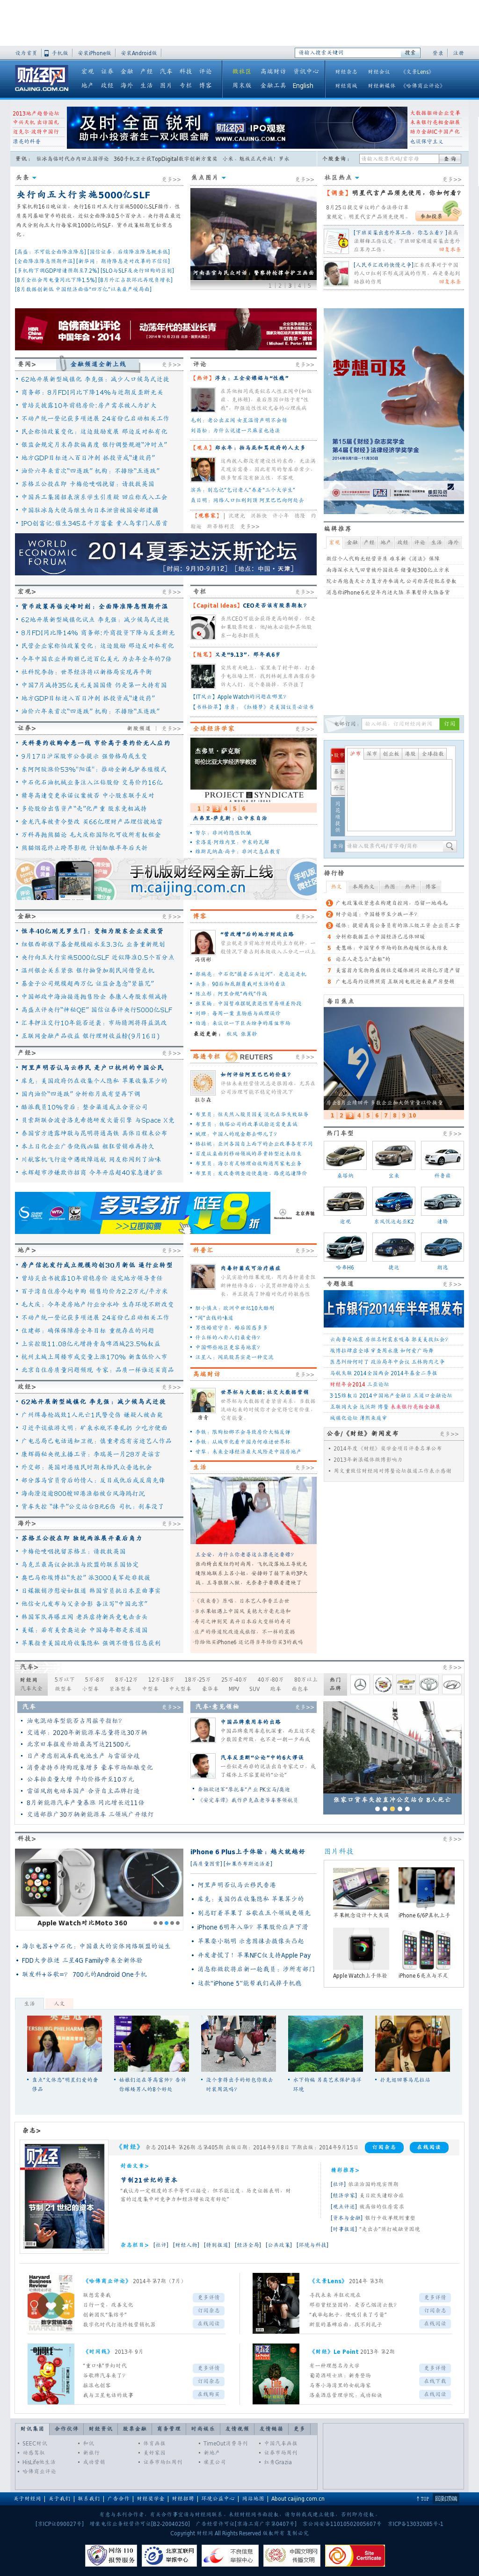 Caijing at Wednesday Sept. 17, 2014, 7:01 a.m. UTC